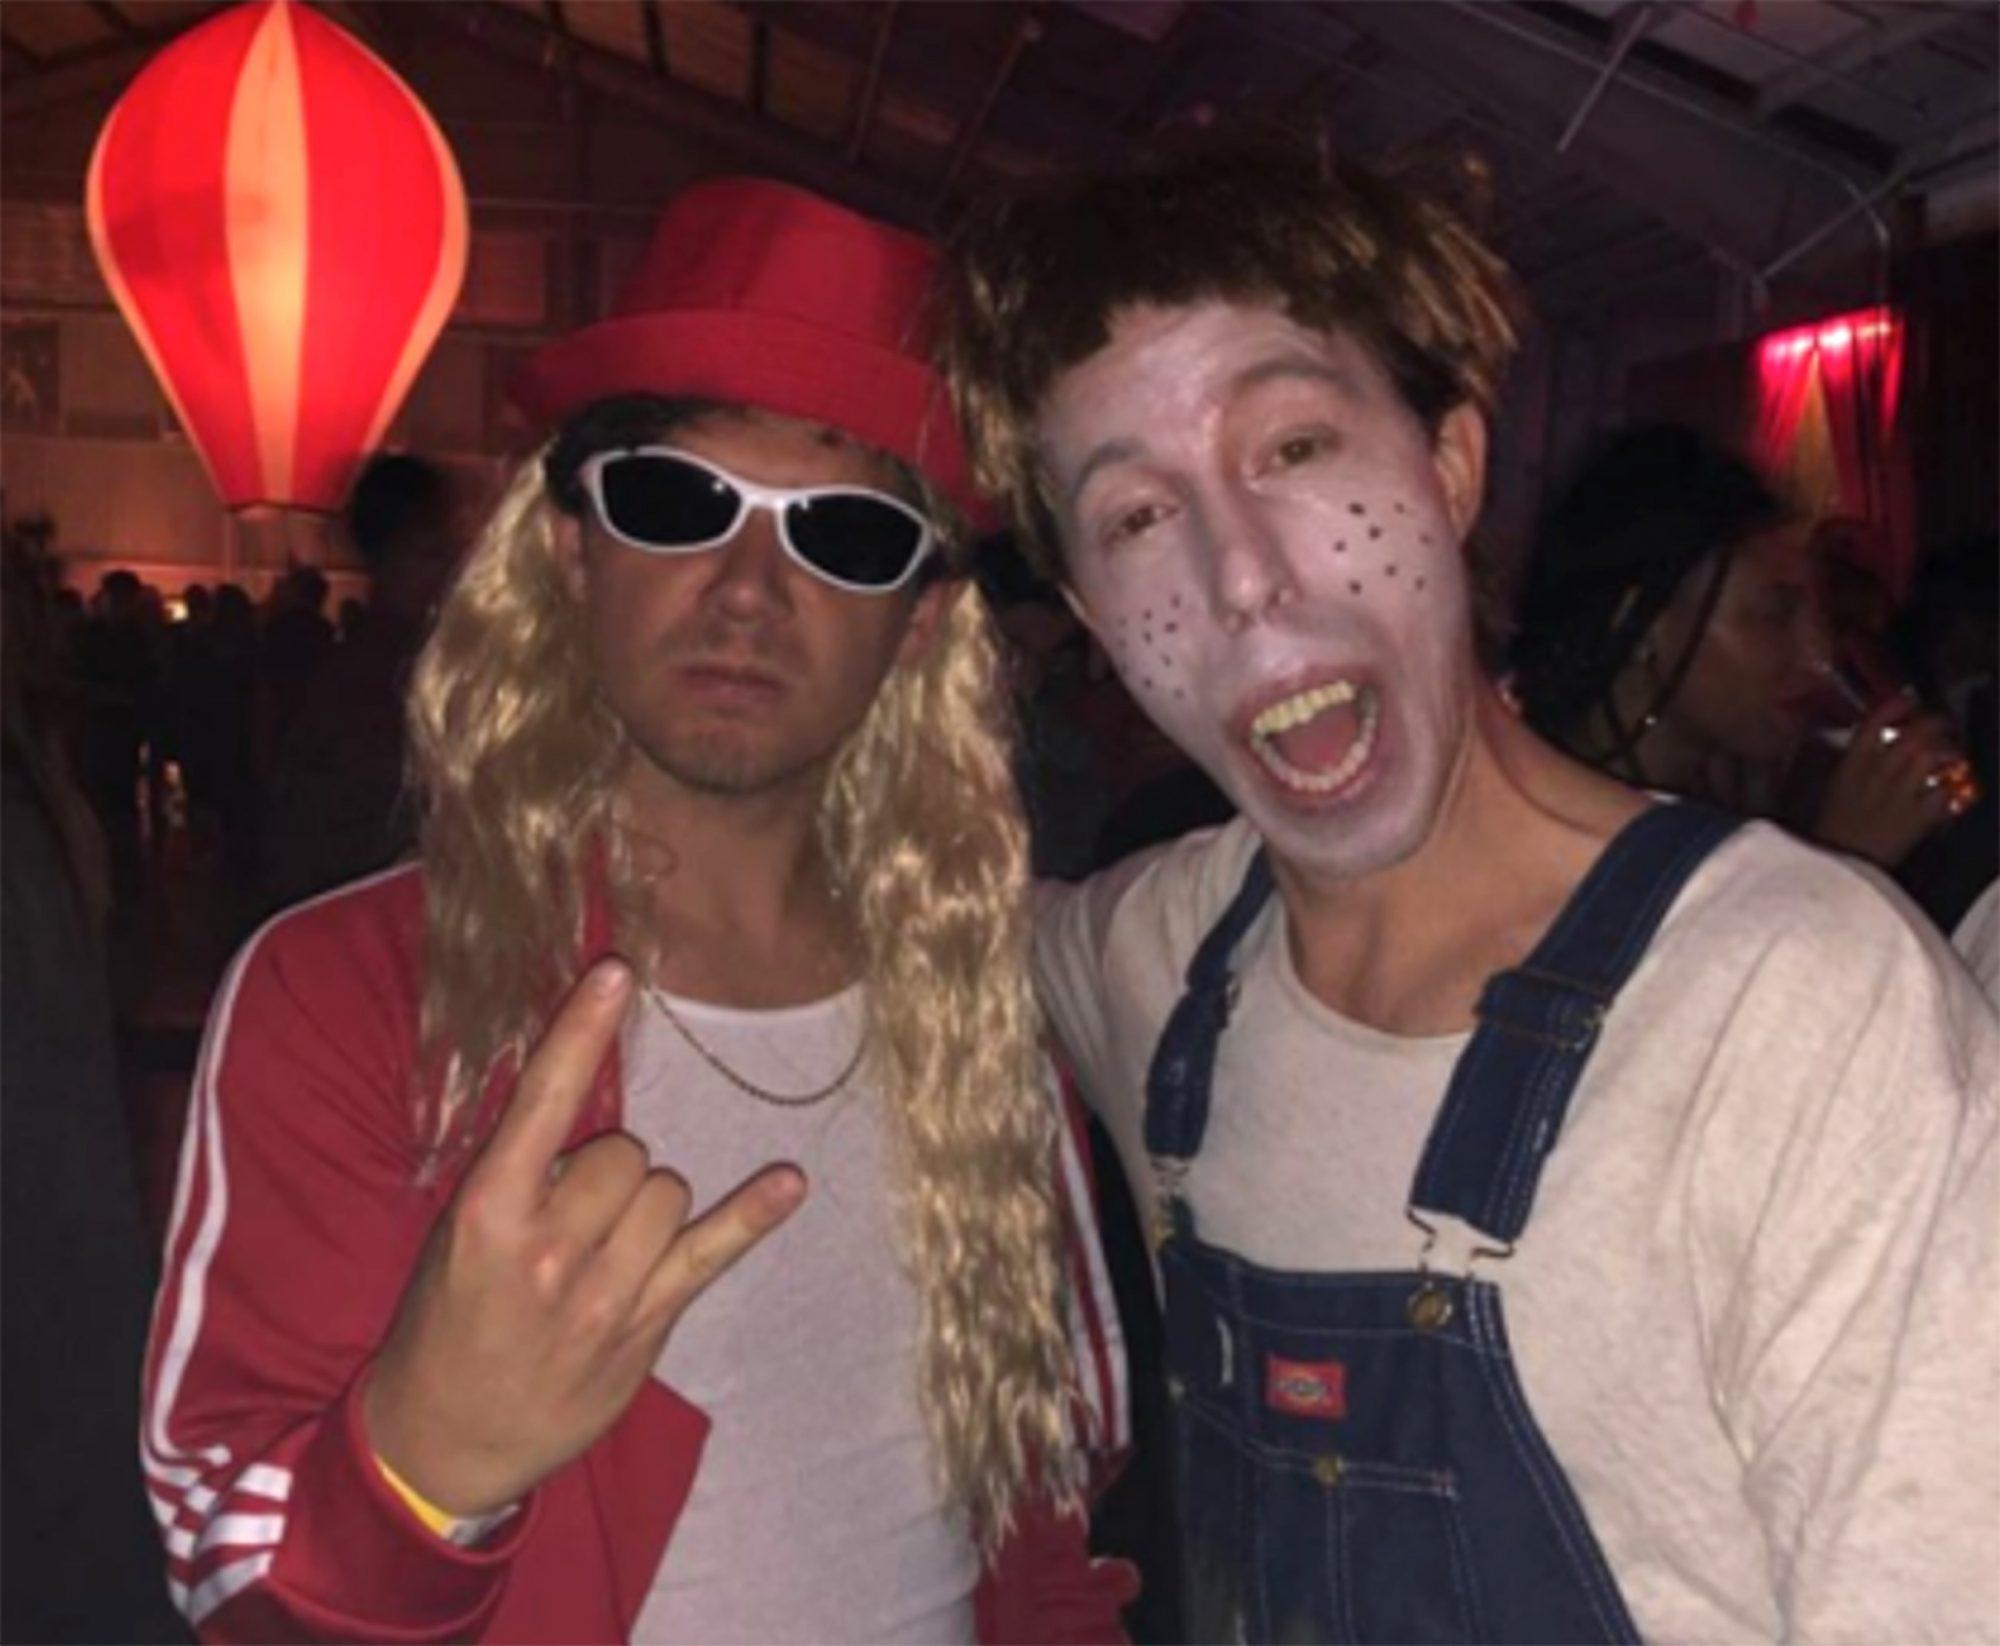 Shaun White Simple Jack costumeCredit: Shaun White/Instagram